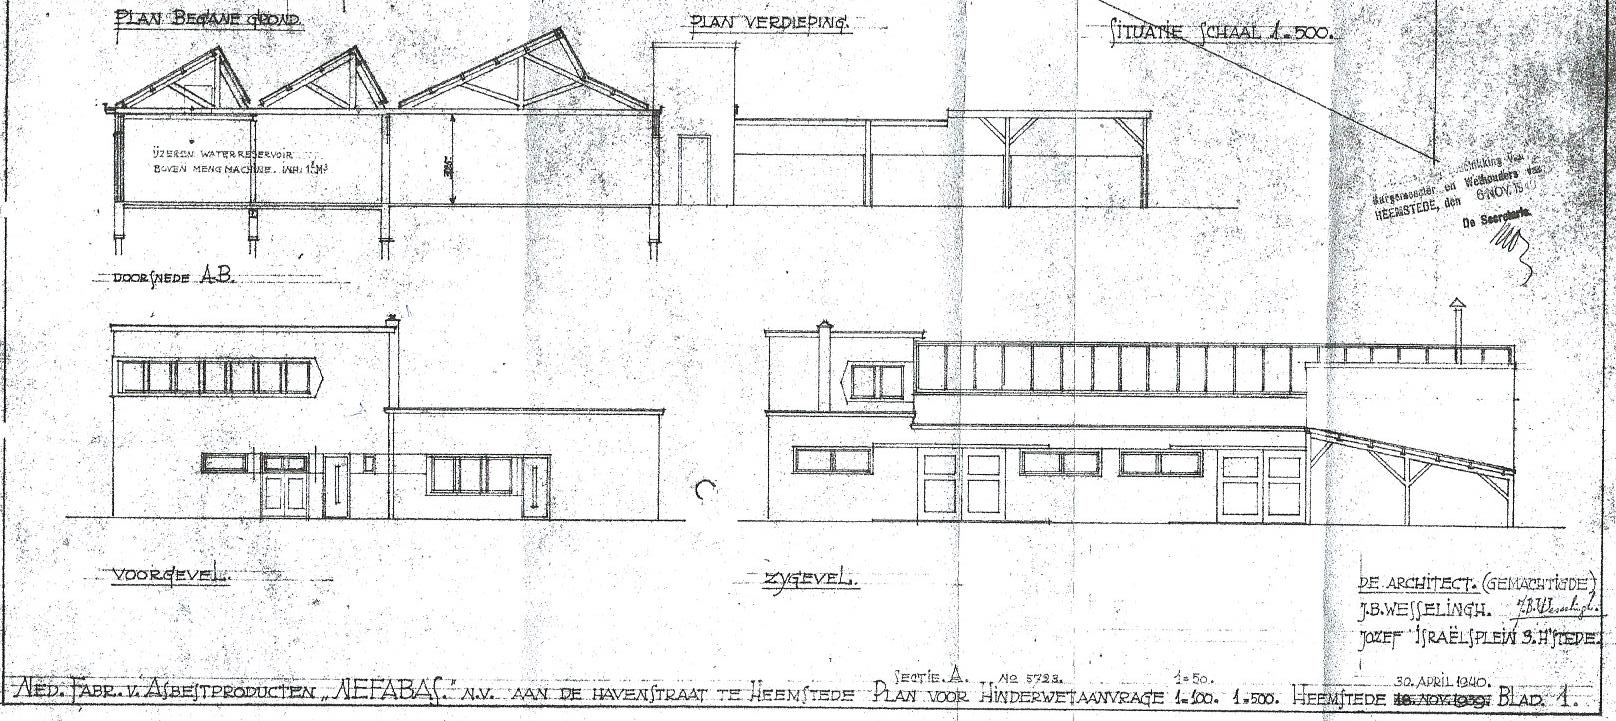 Uitsnede tekening Nefabas-fabriek 1939(bouwkundearchief Heemstede)